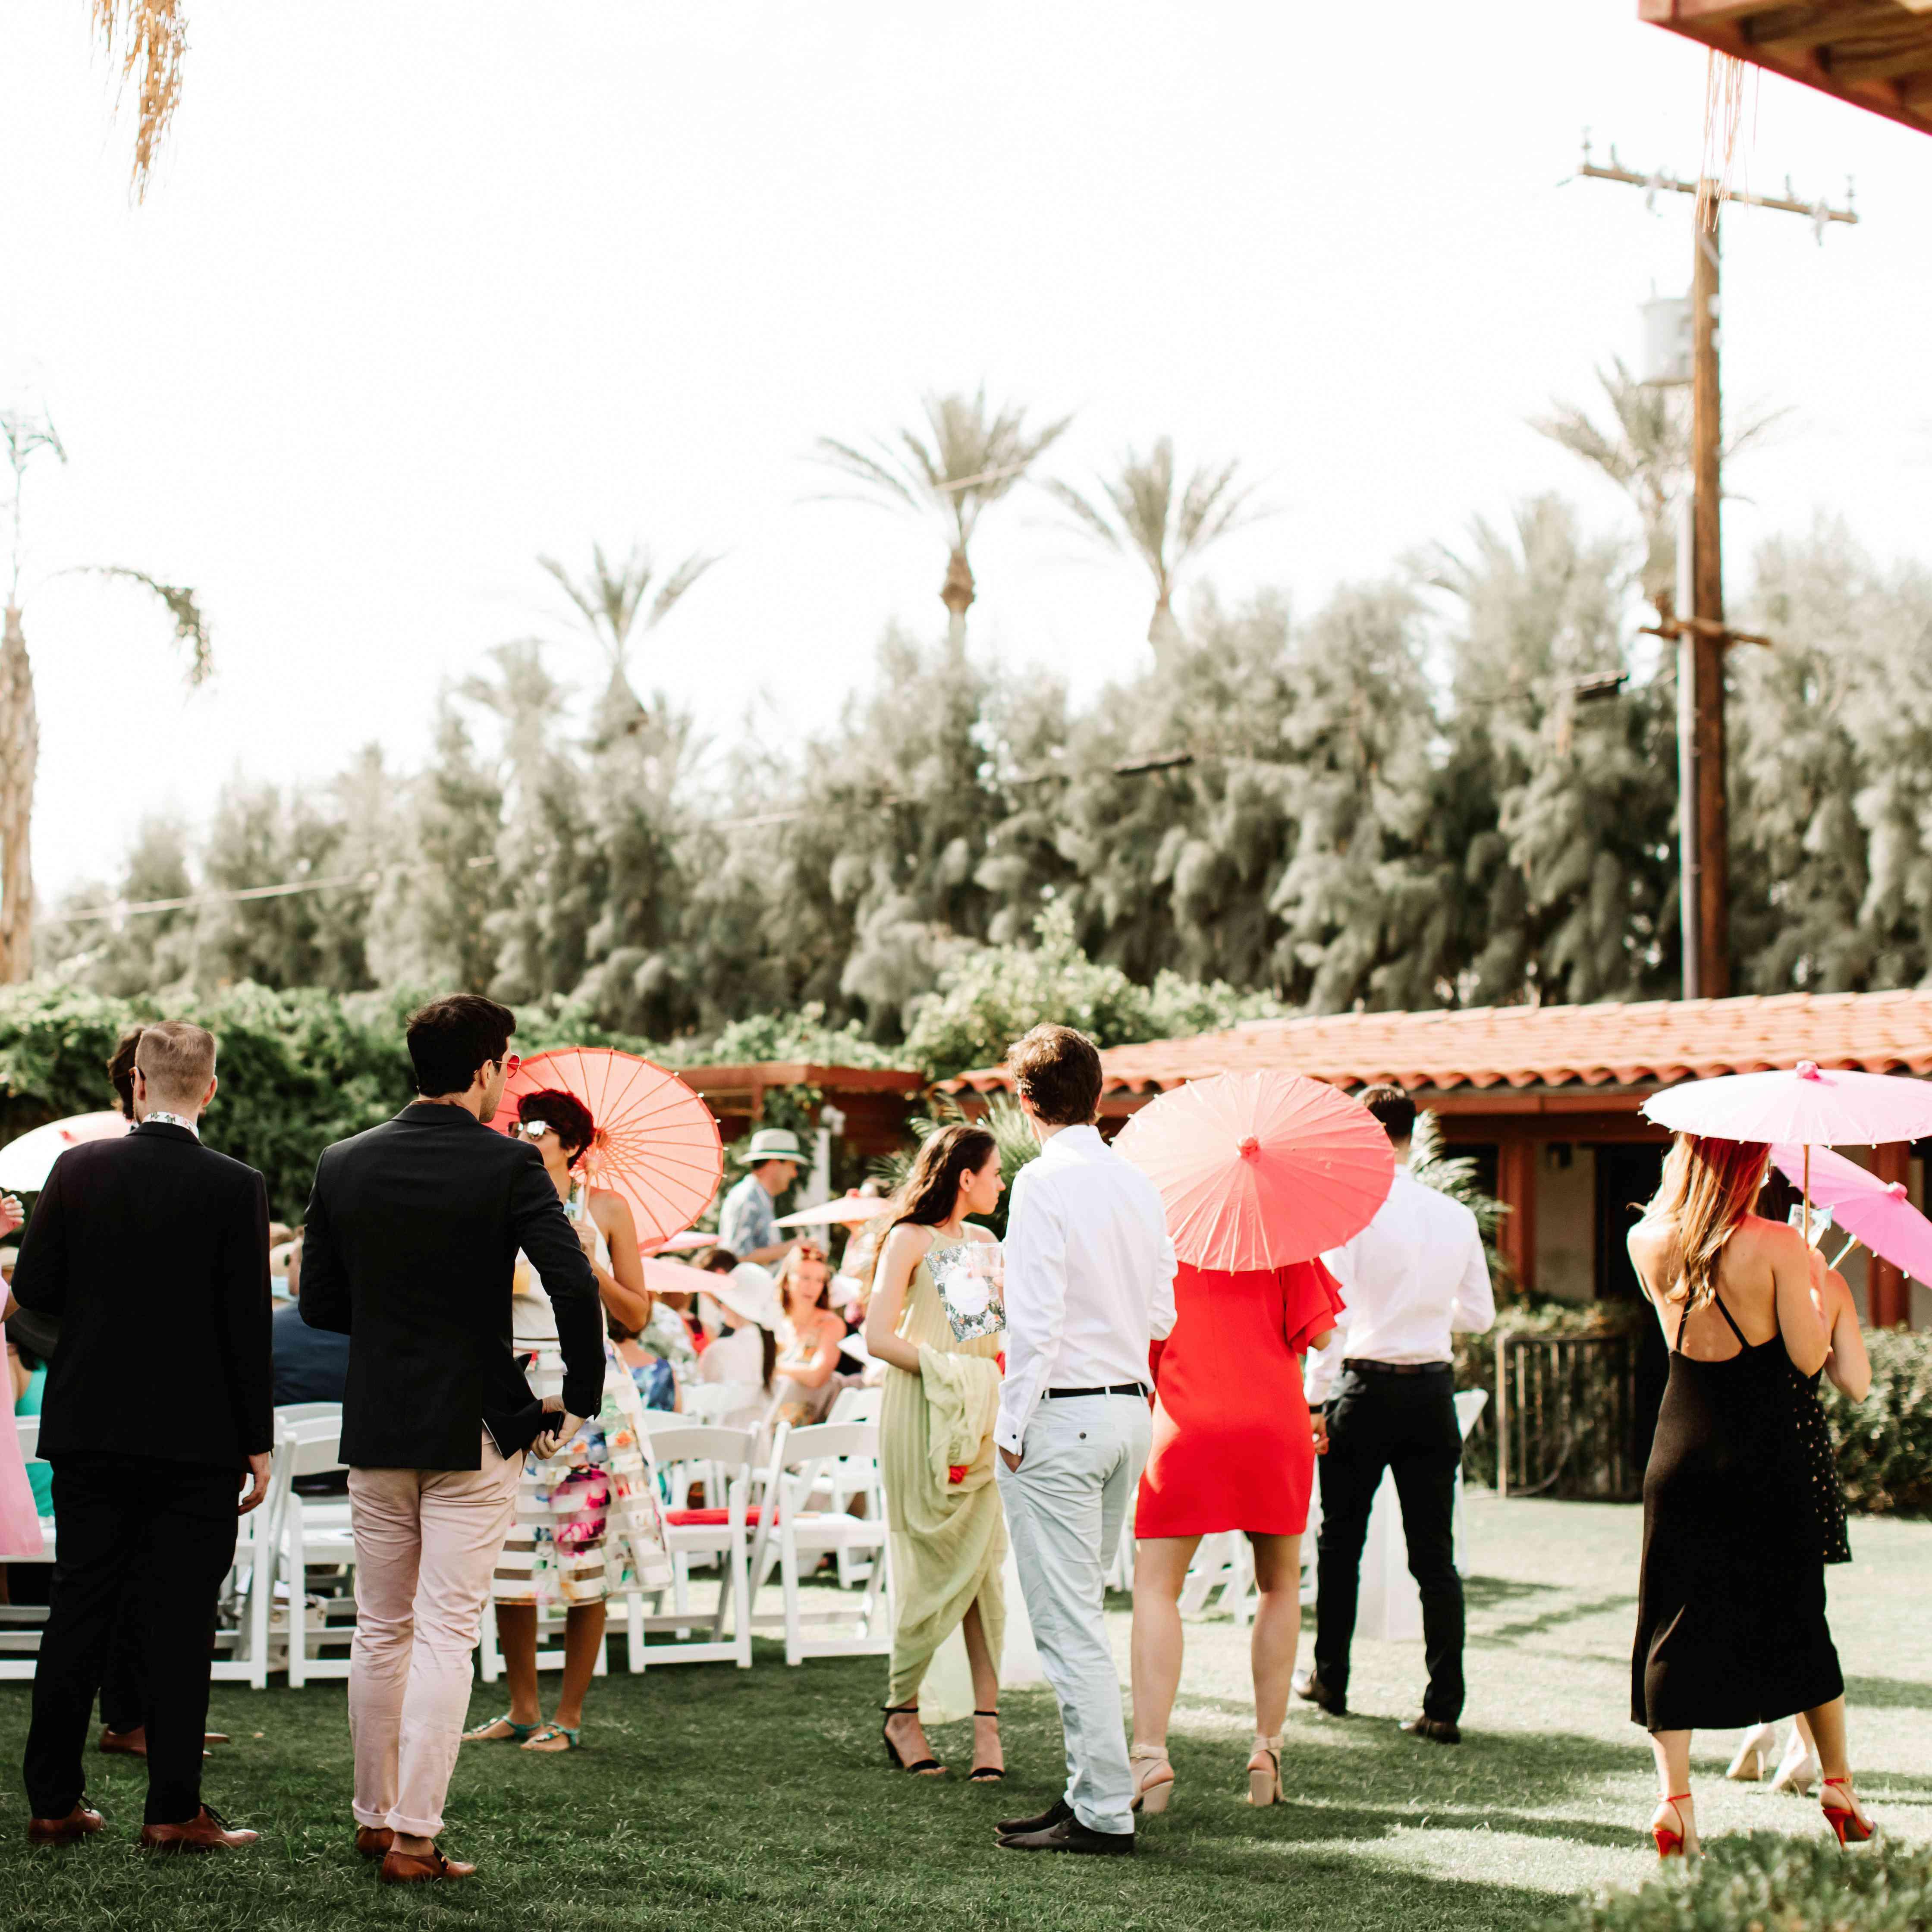 Backyard Wedding Decor For Your Outdoor Ceremony